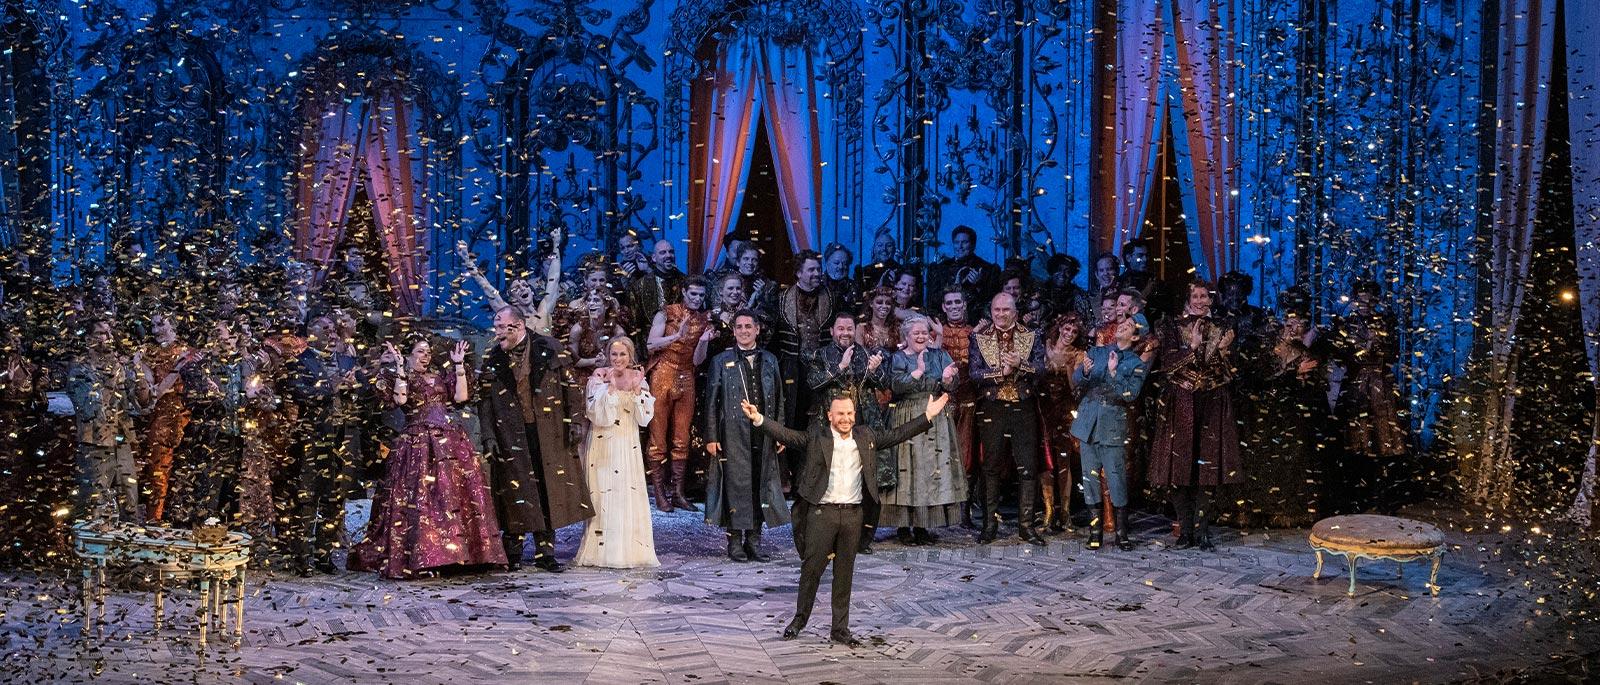 Metropolitan Opera: δωρεάν στην οθόνη σας!